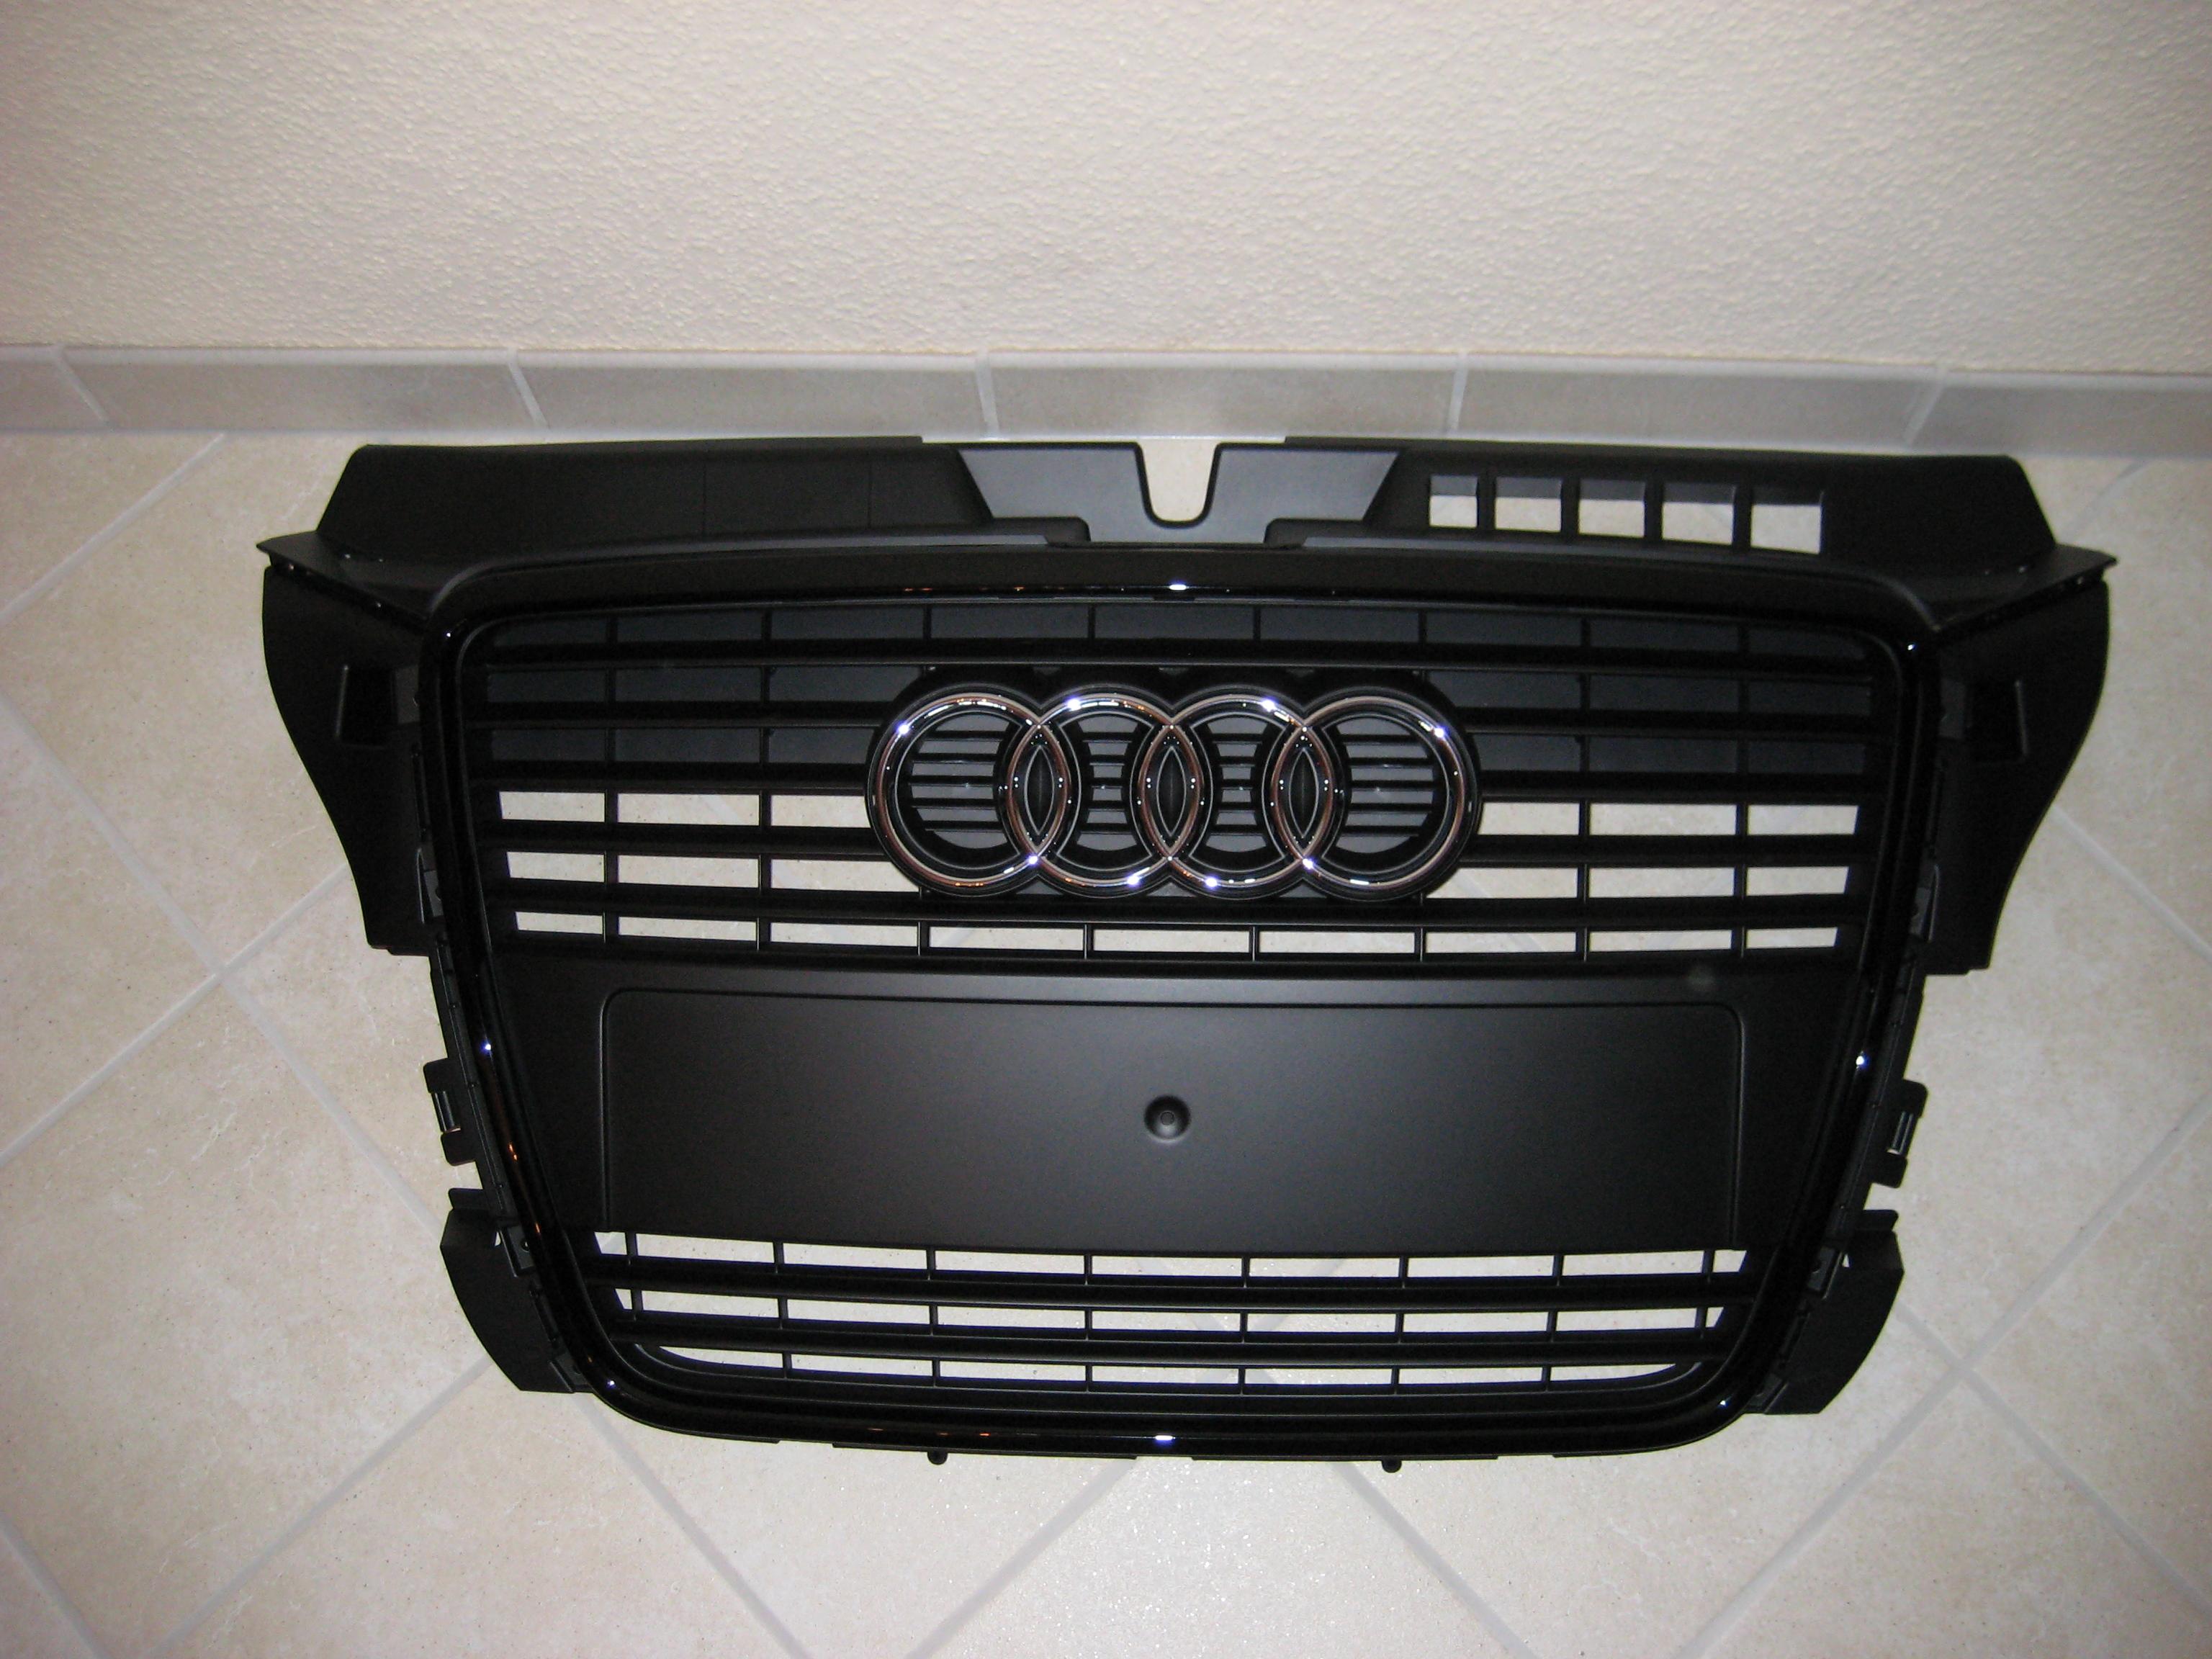 8p Grill Wechseln Passt Dieser Audi A3 Forum F 252 R